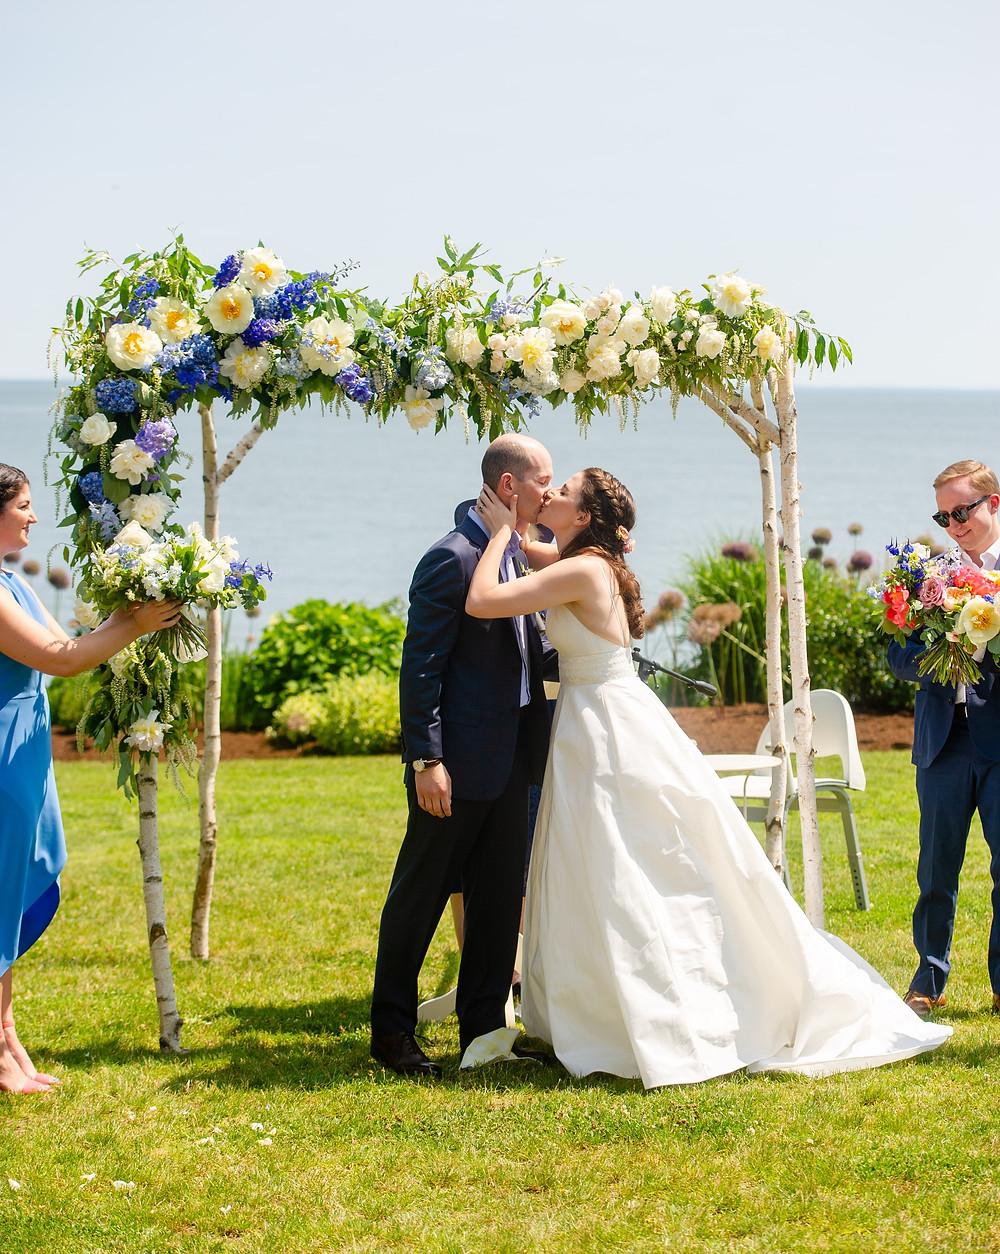 Wedding Chuppah ceremony at The Owenego